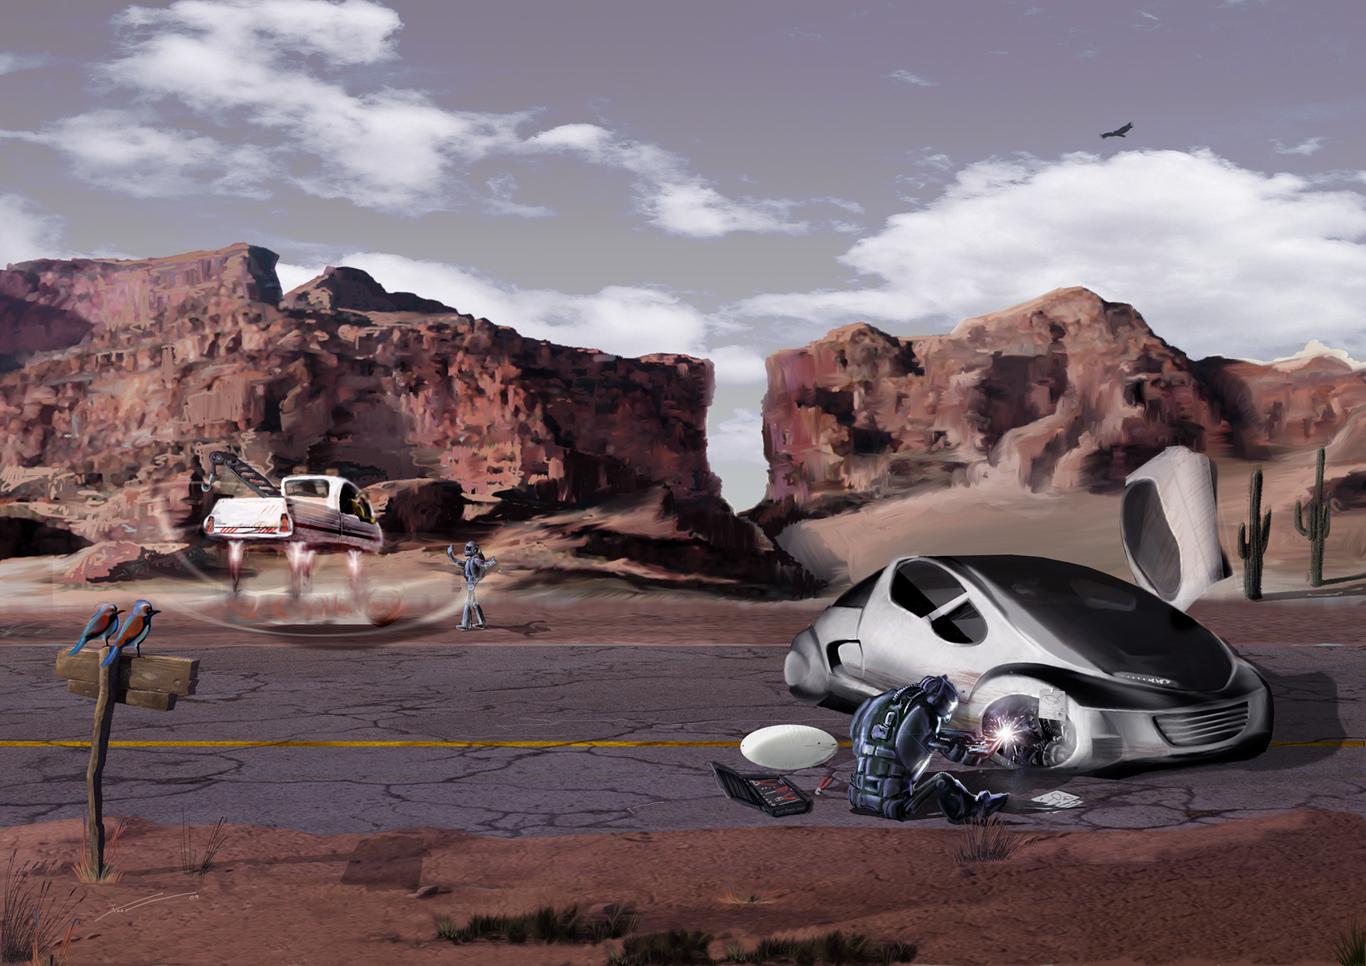 Xoanbaltar desert crash 1 3da92336 vf8n